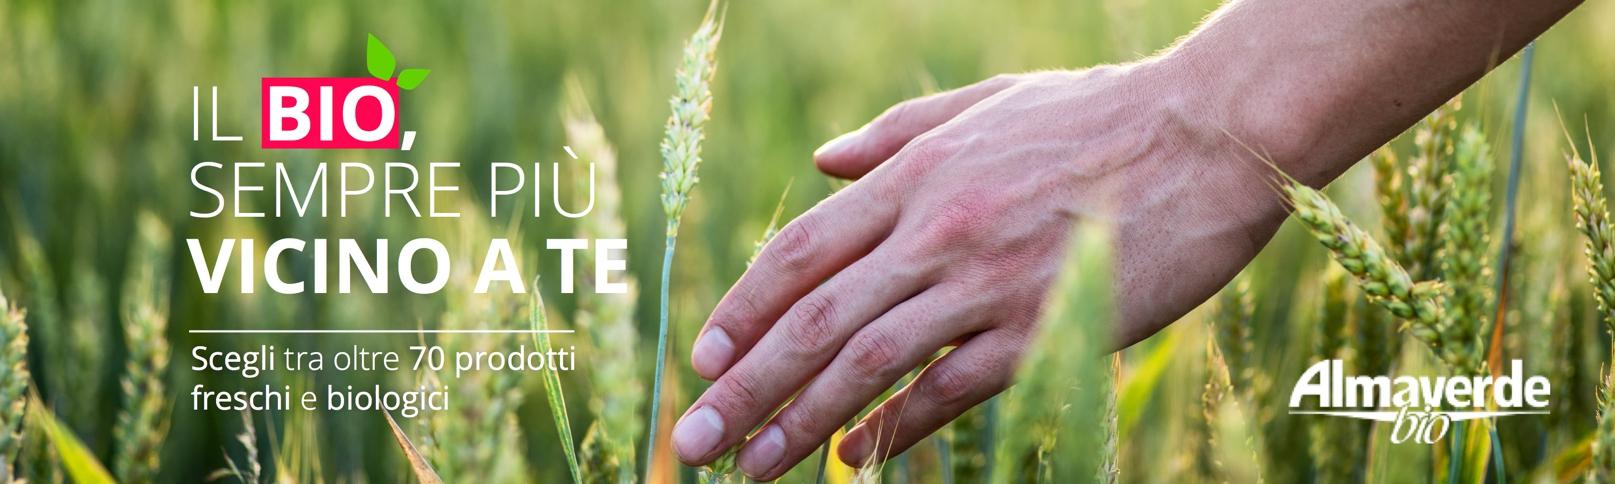 Almaverde Bio prodotti biologici